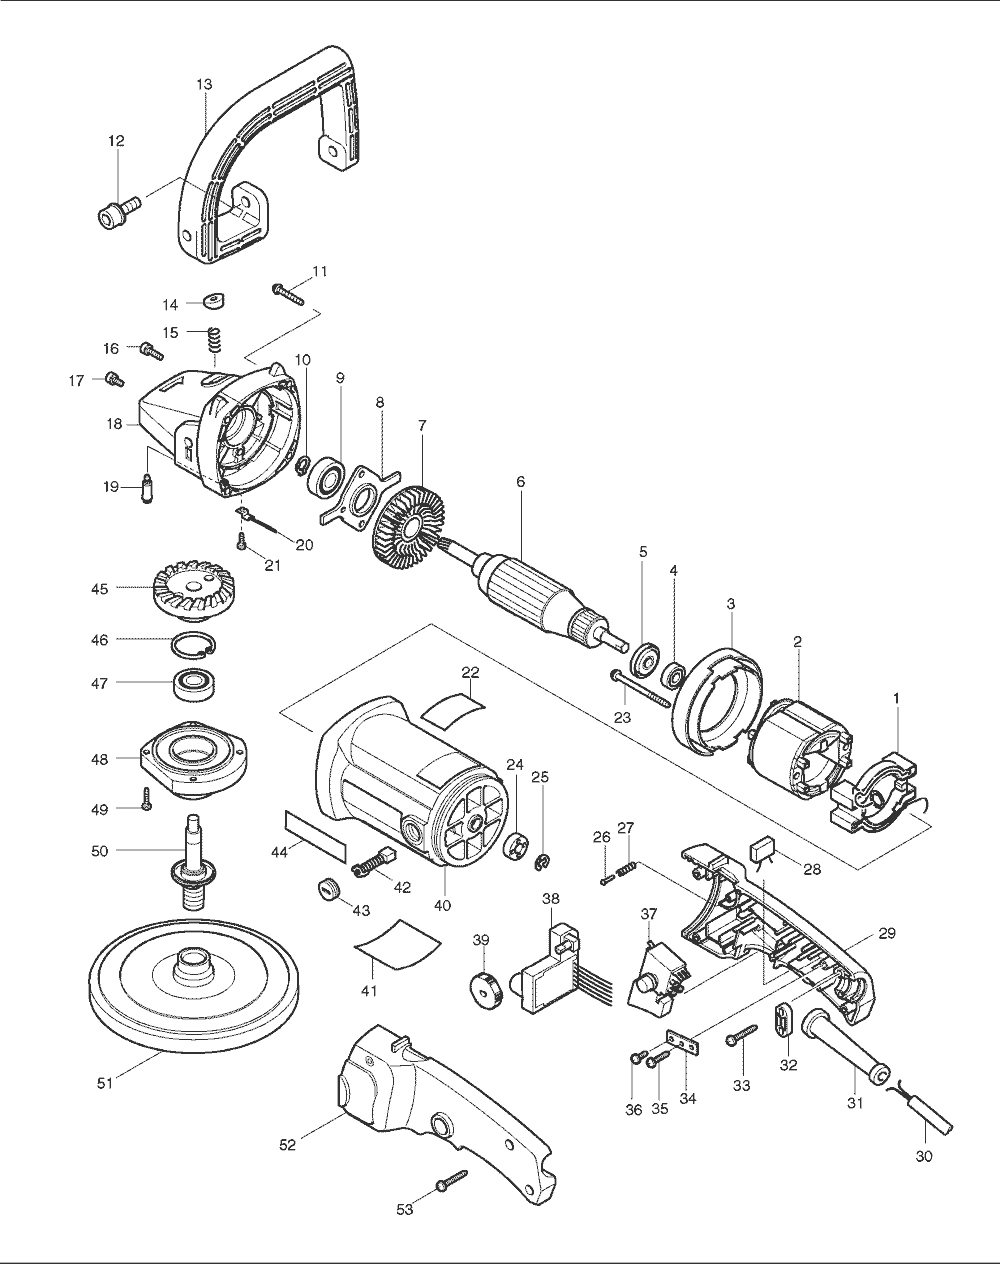 Makitum Jr3000v Wiring Diagram